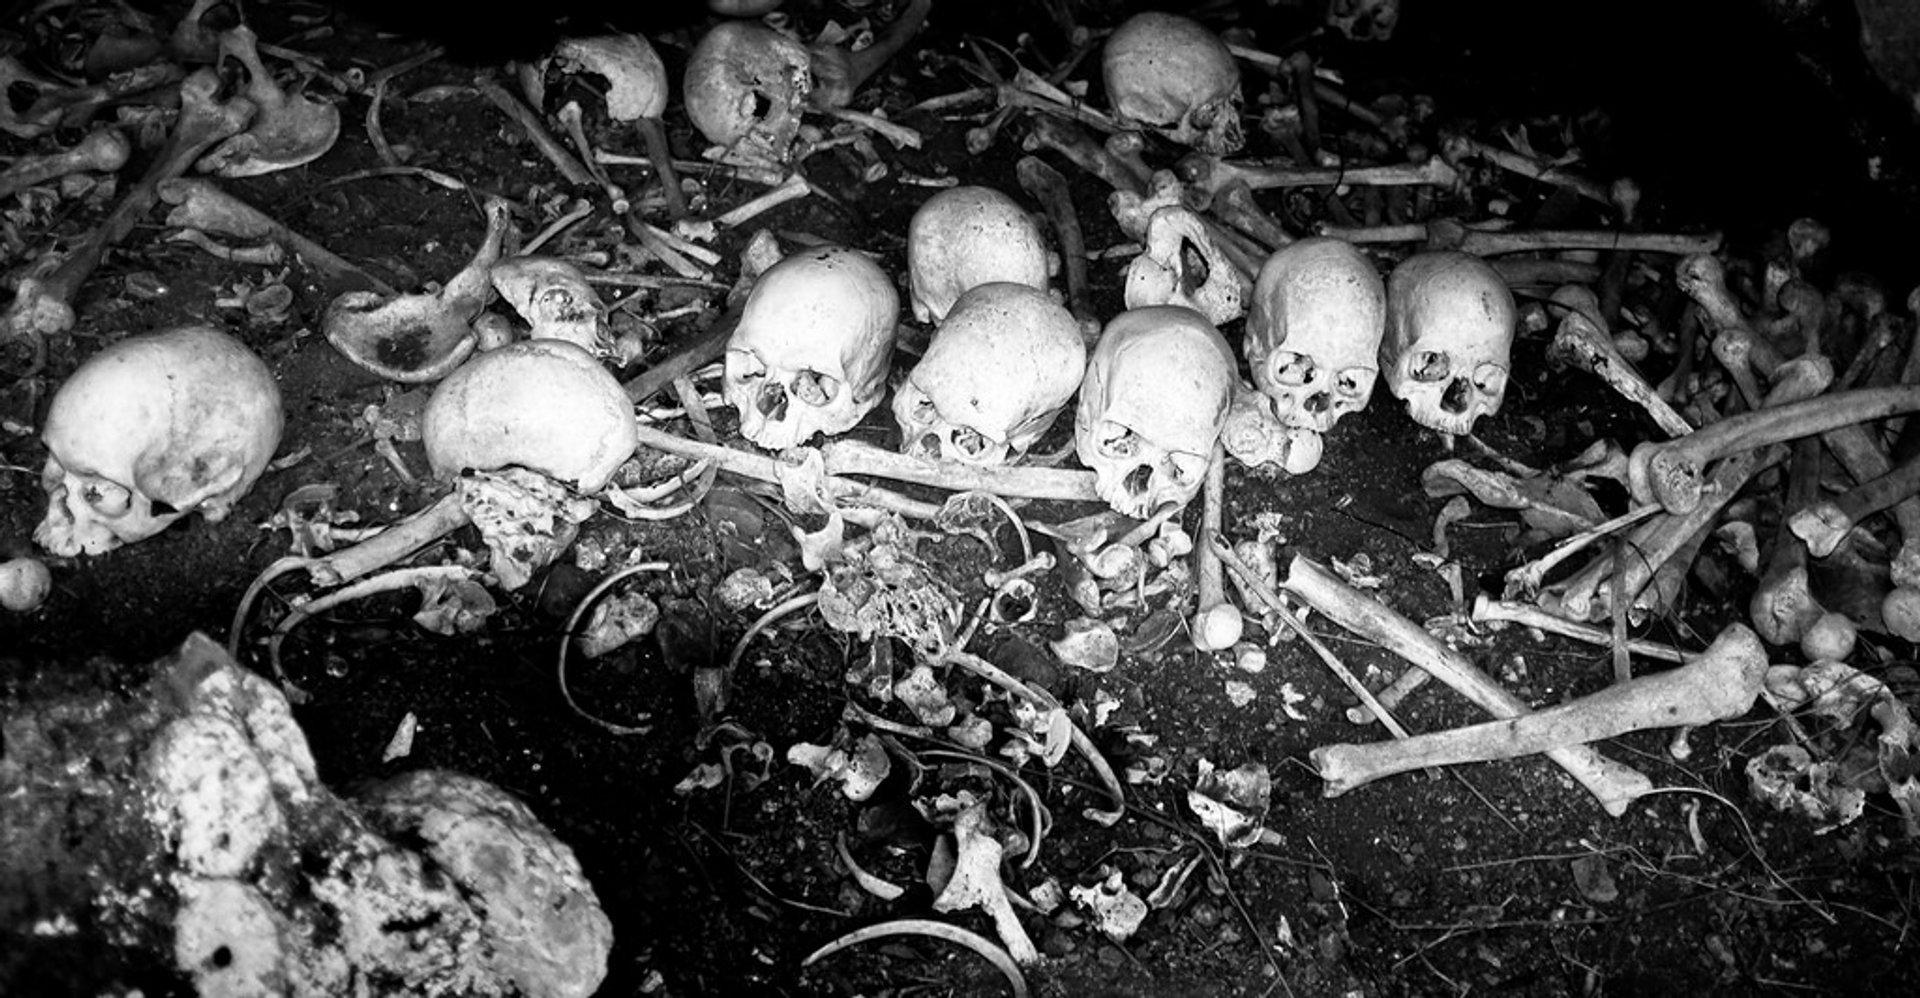 Naihehe Cannibal Cave in Fiji 2019 - Best Time